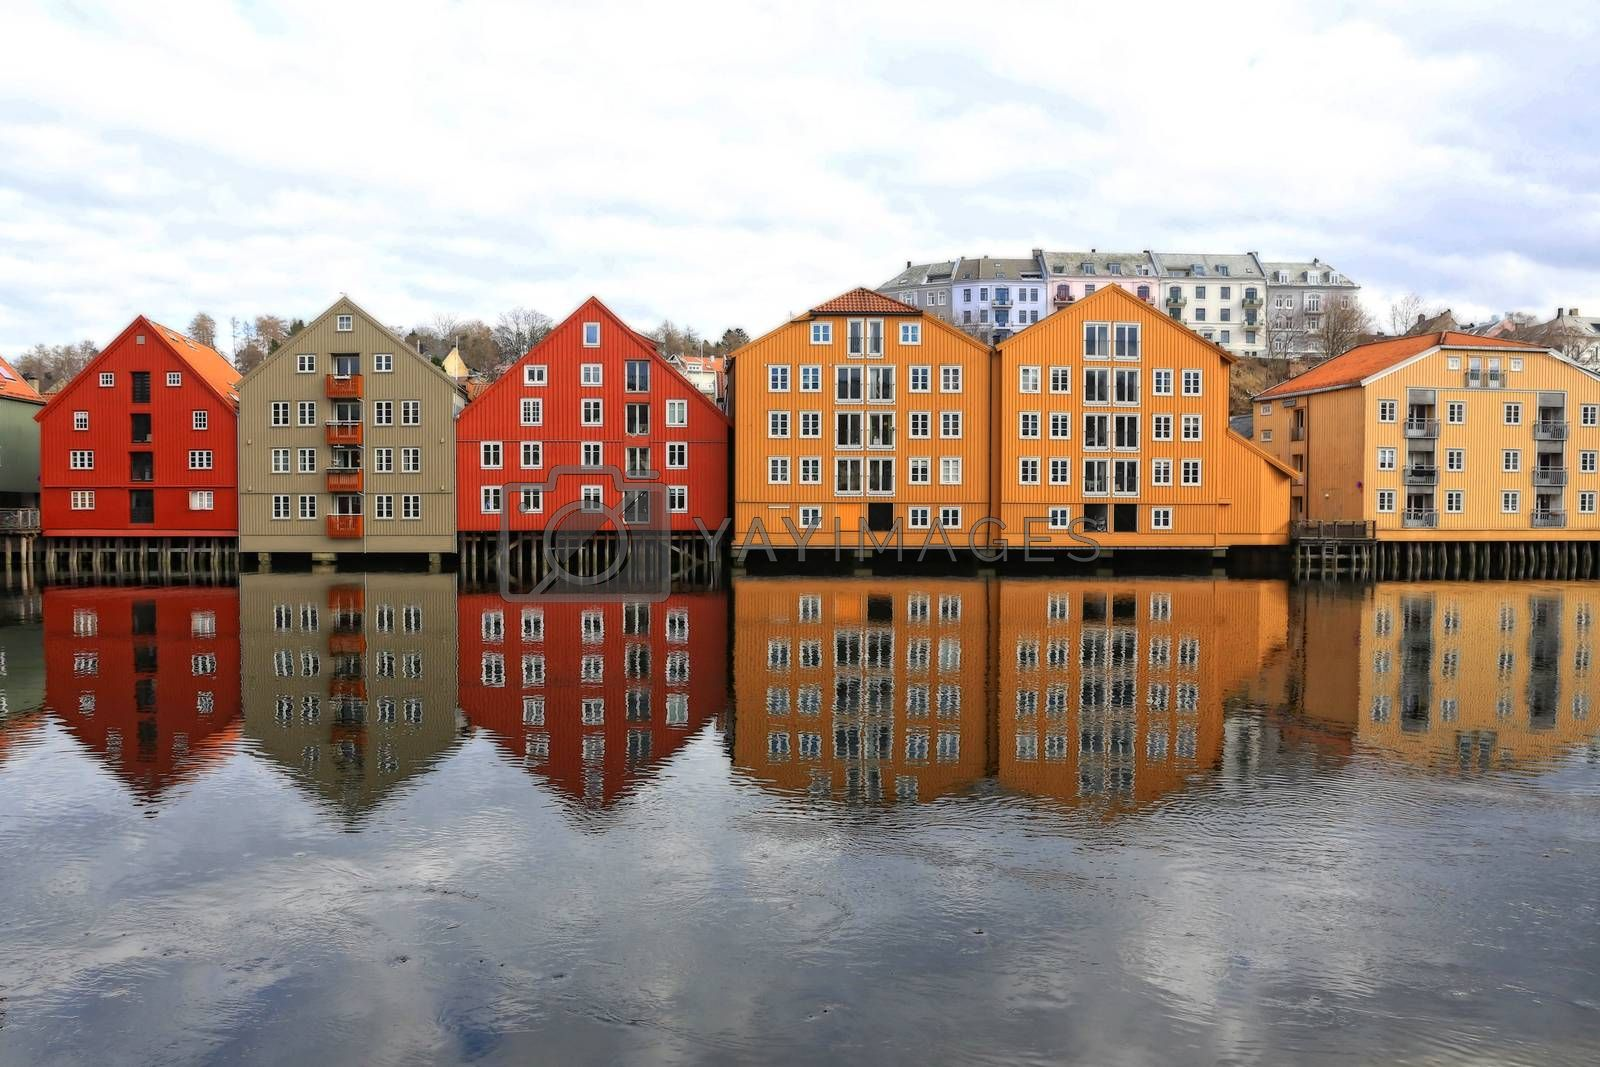 Rundtur i Trondheim en vårdag - Ved Nidelven